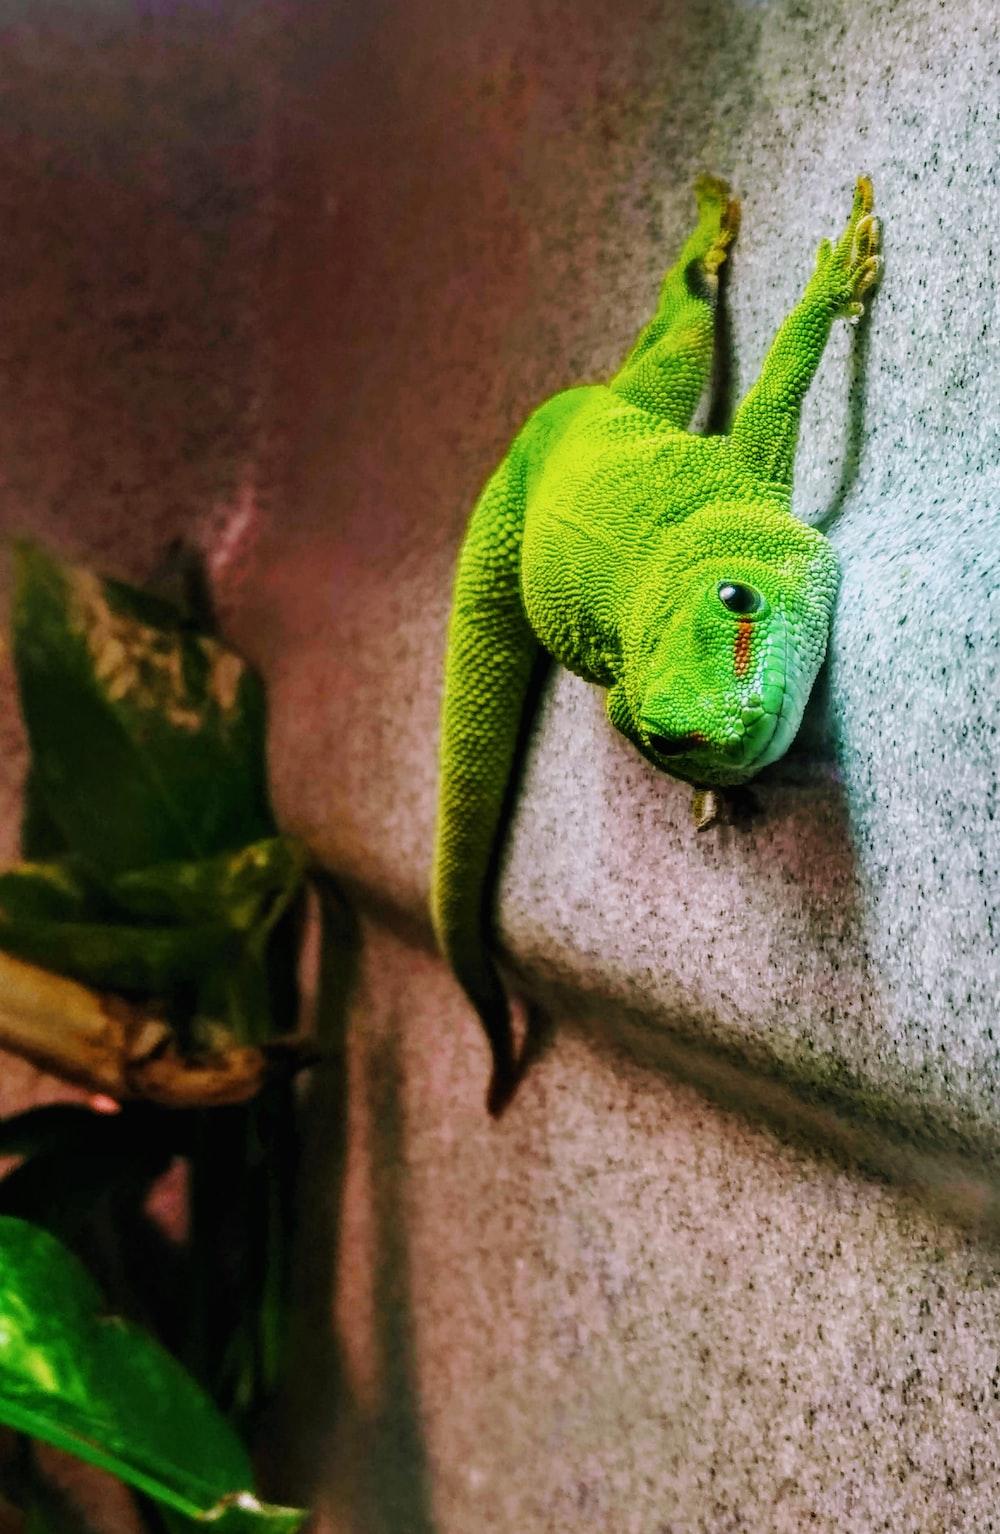 green crocodile plush toy on gray concrete wall